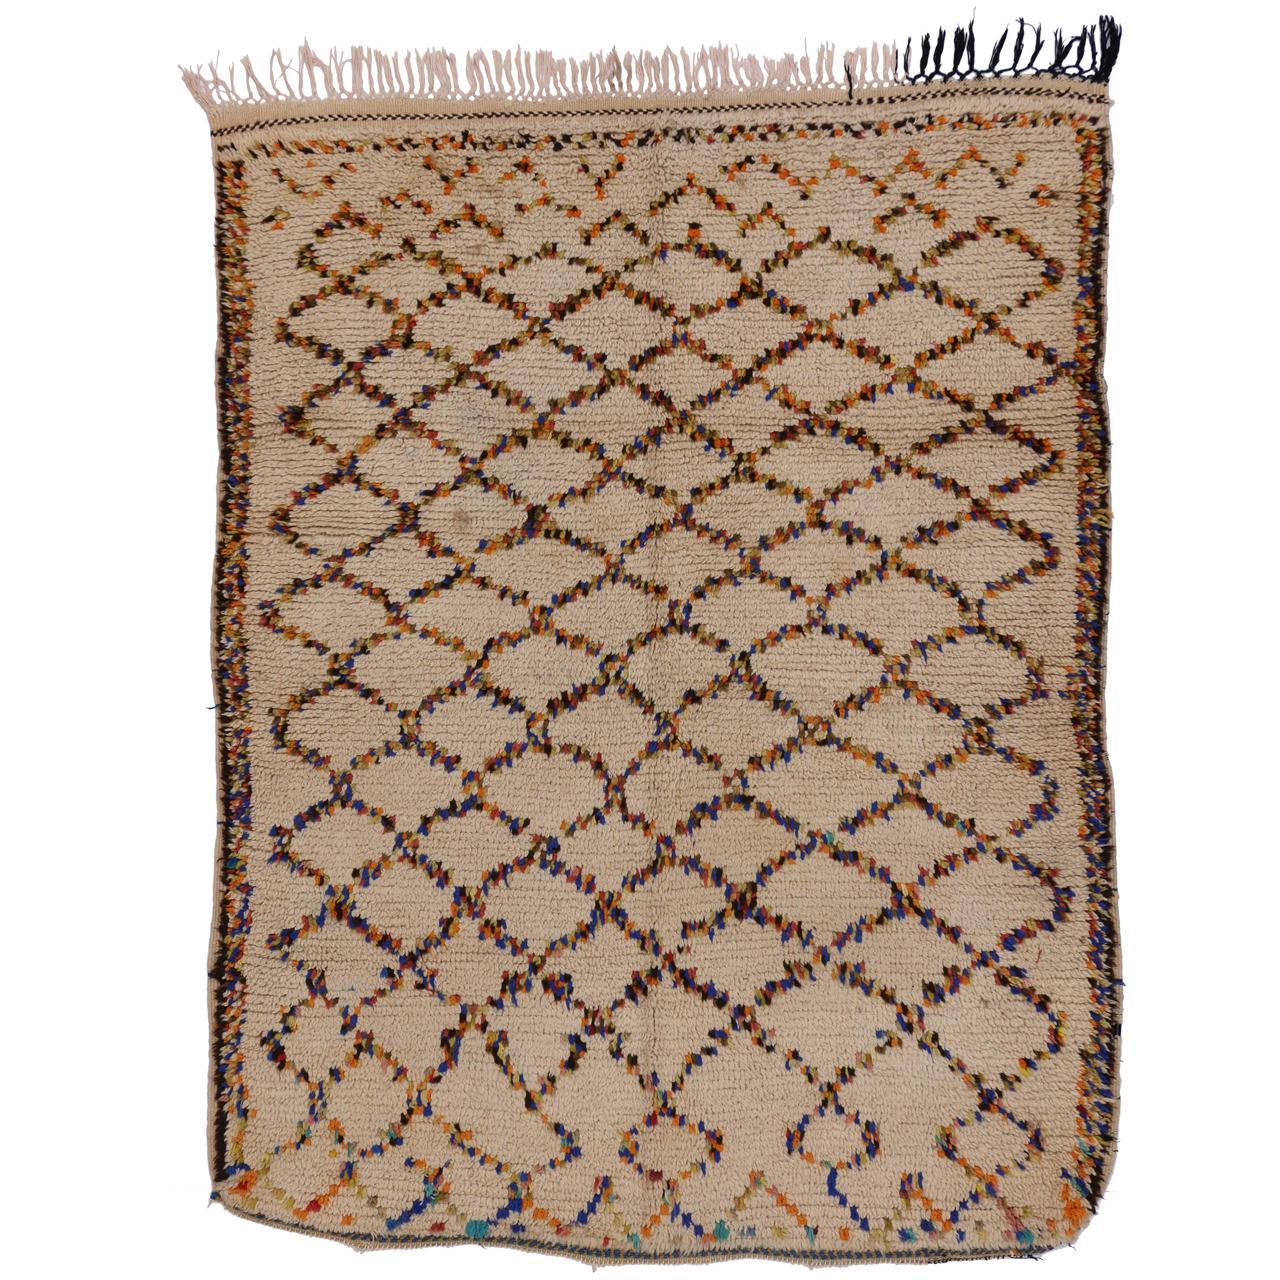 Berber Moroccan Rug With Latticework Design For Sale At